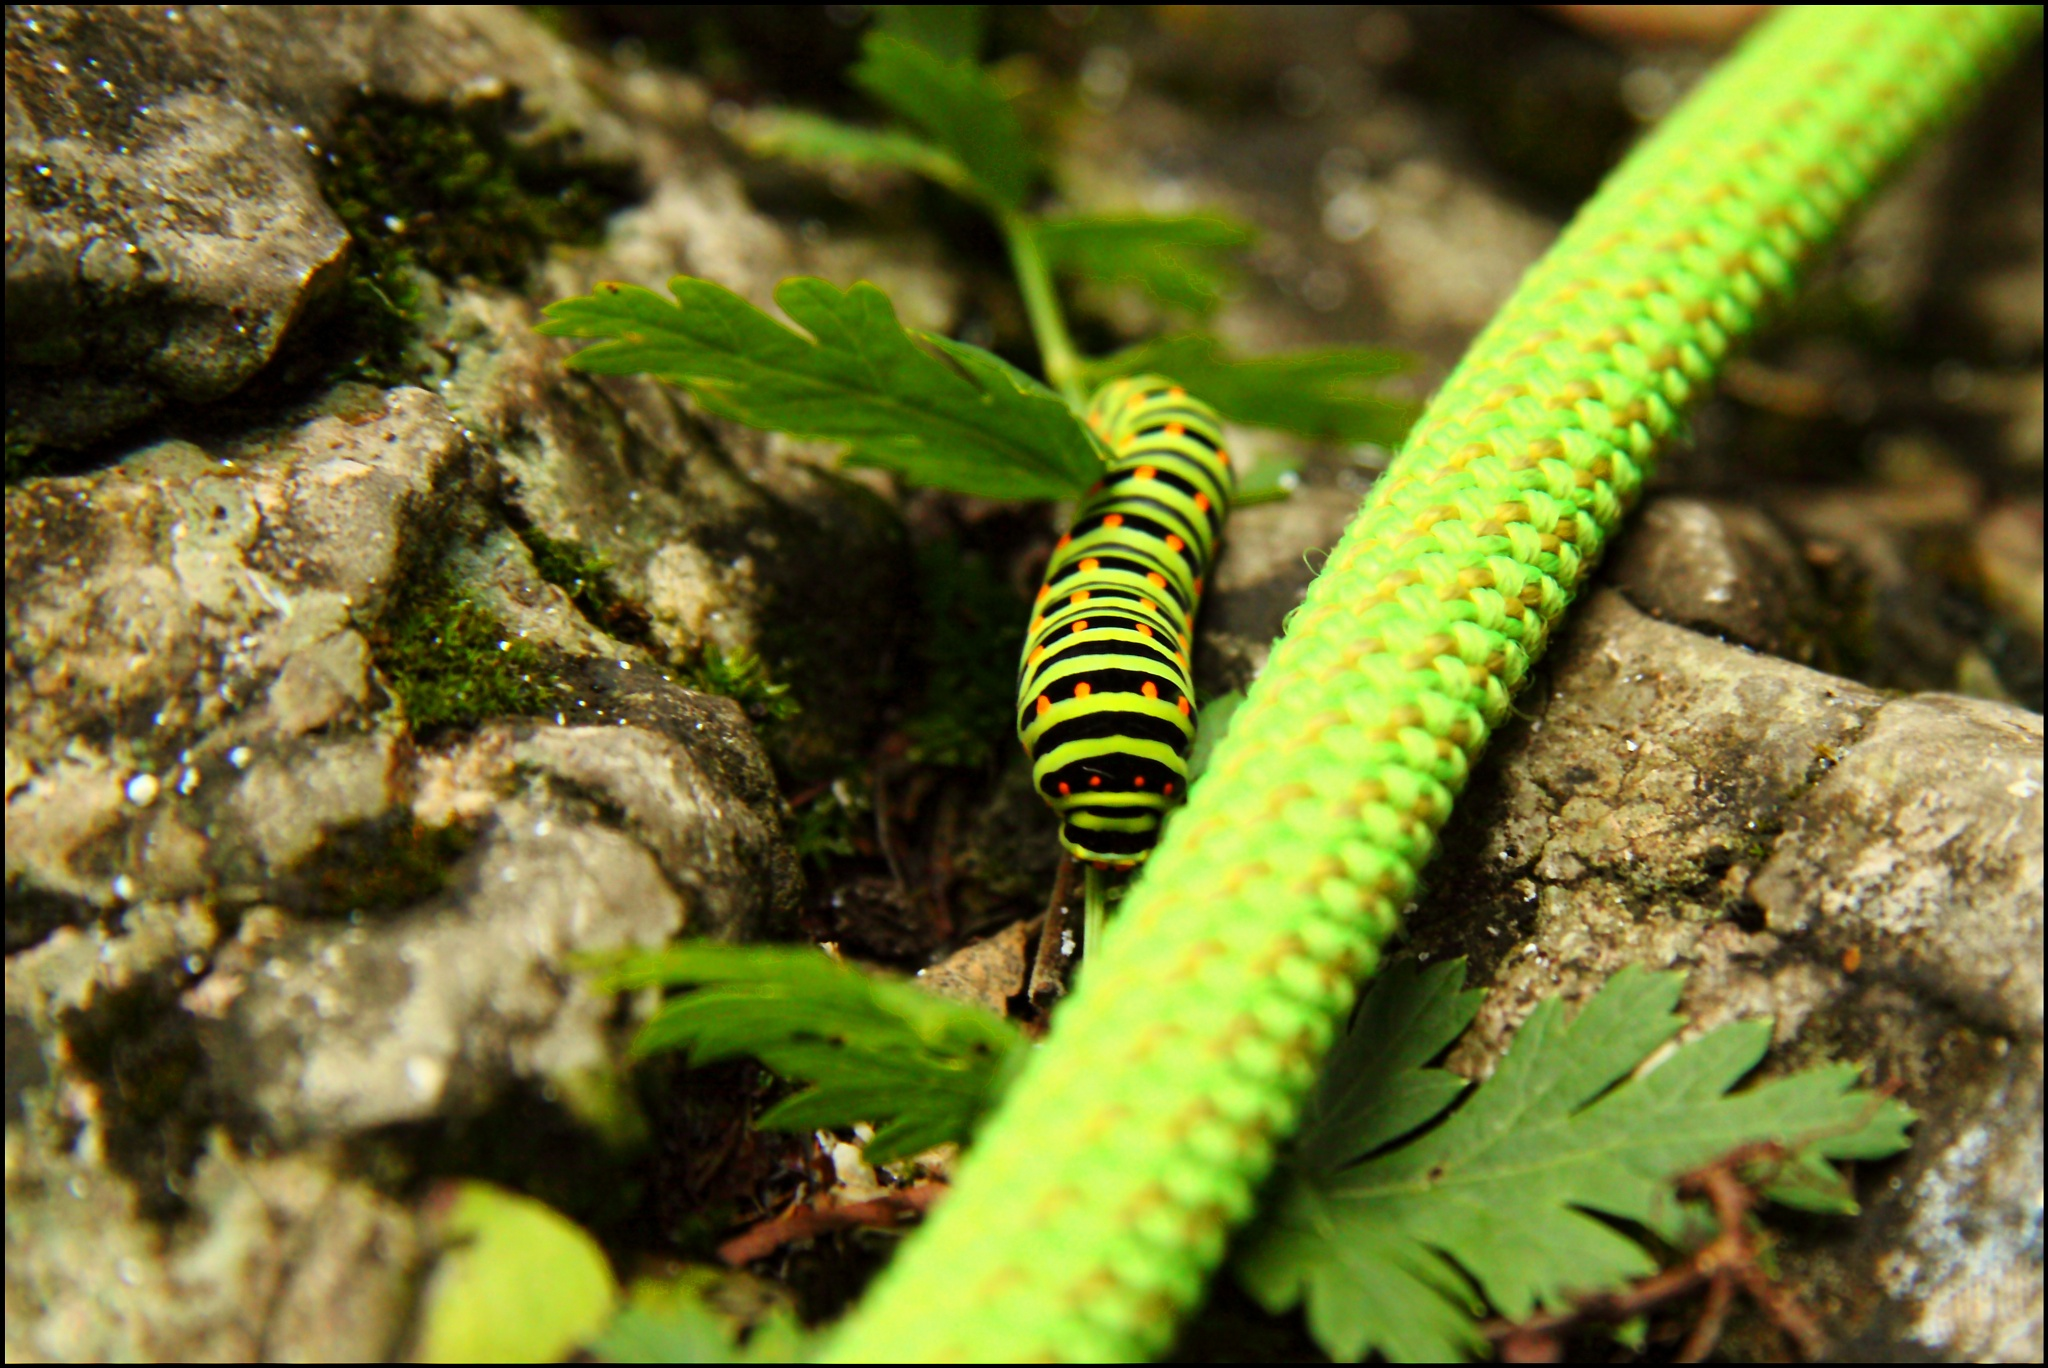 swallowtail caterpillar by tomekgorski